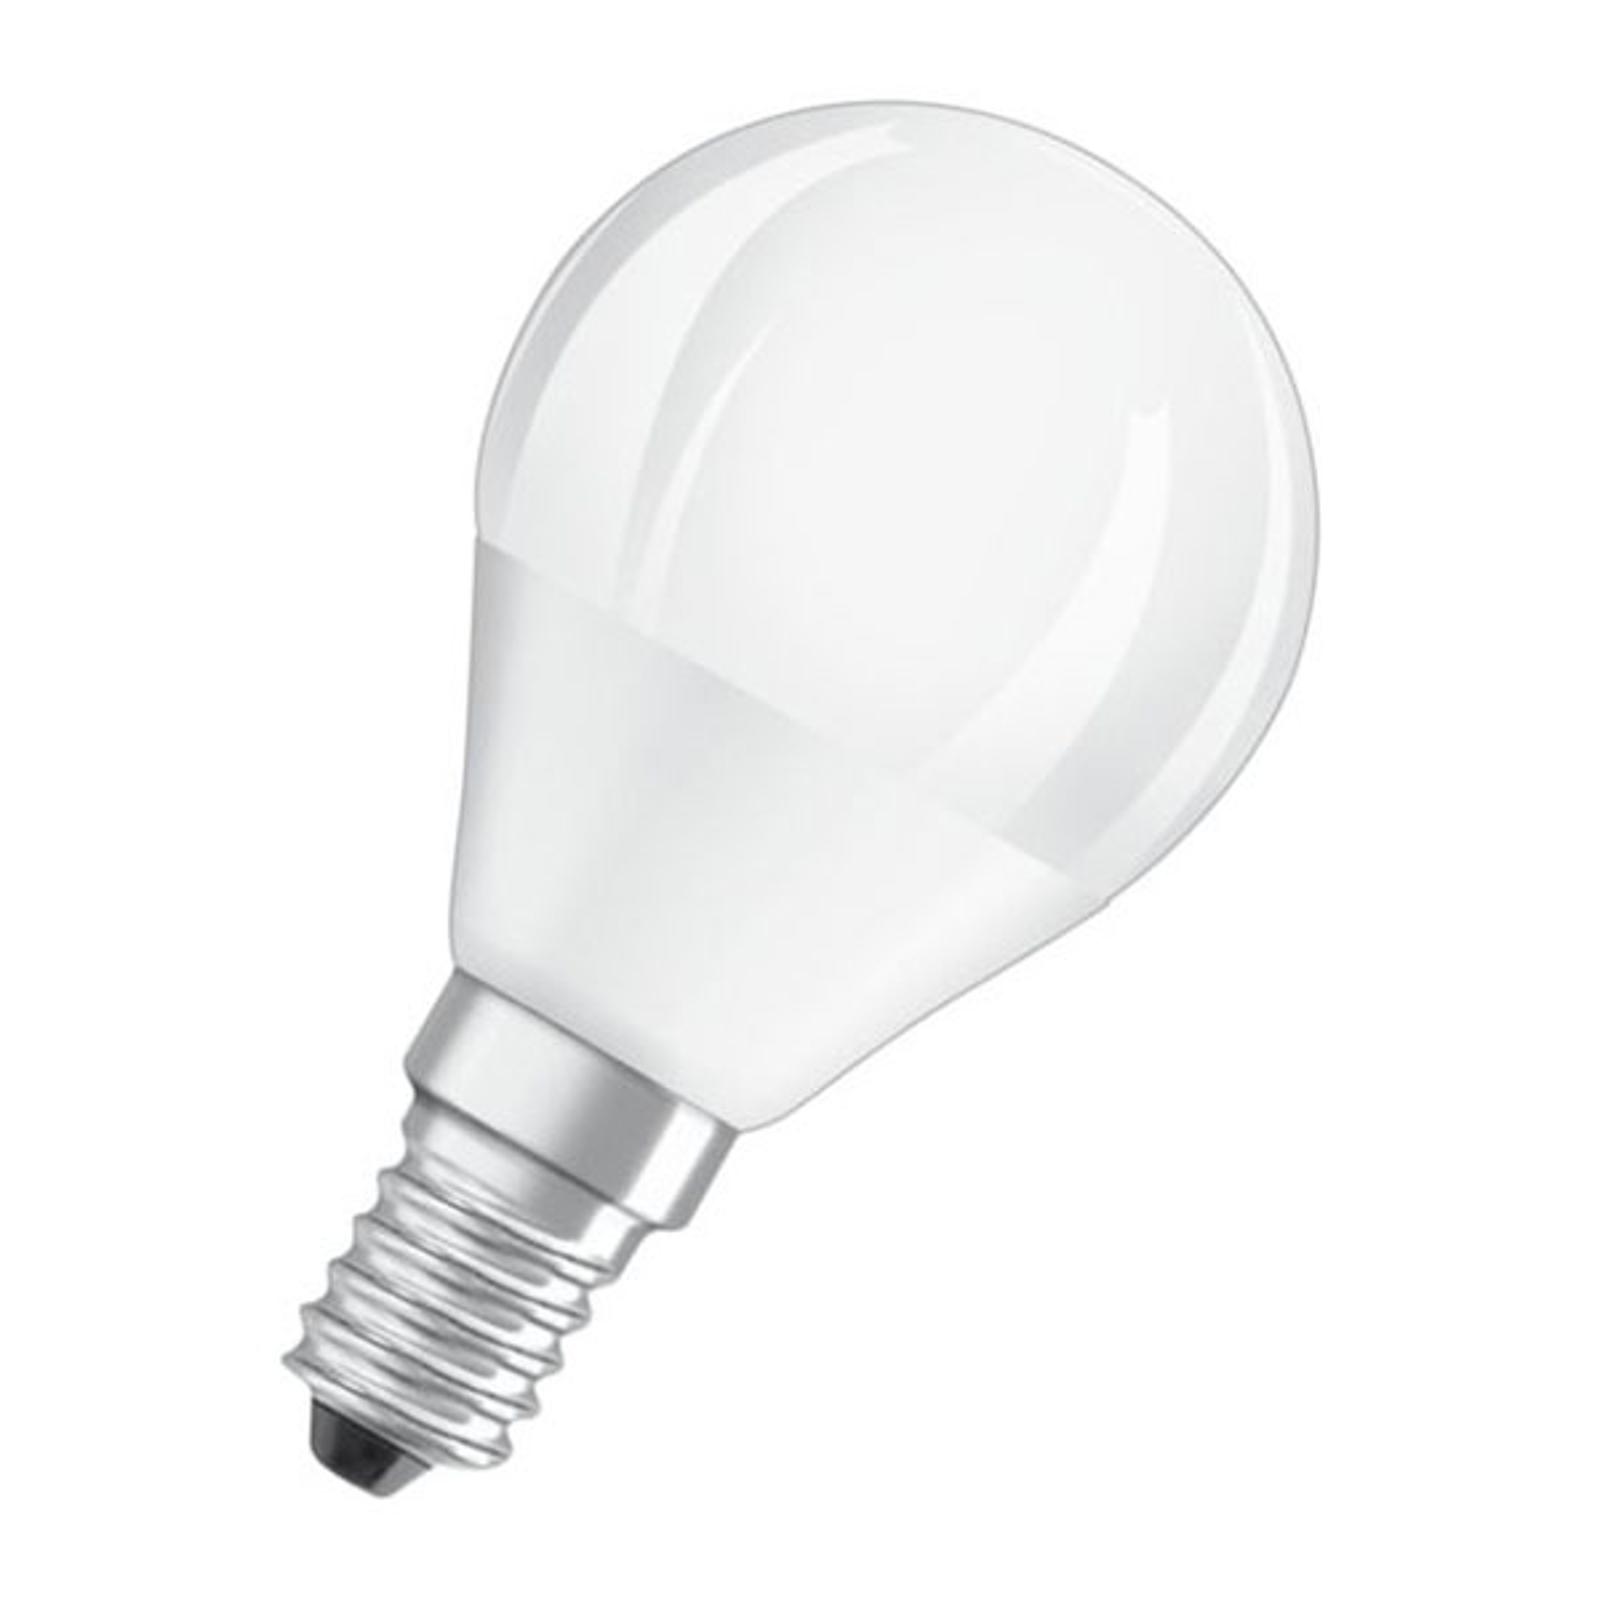 OSRAM żarówka LED E14 4,5W 827 Superstar matowa